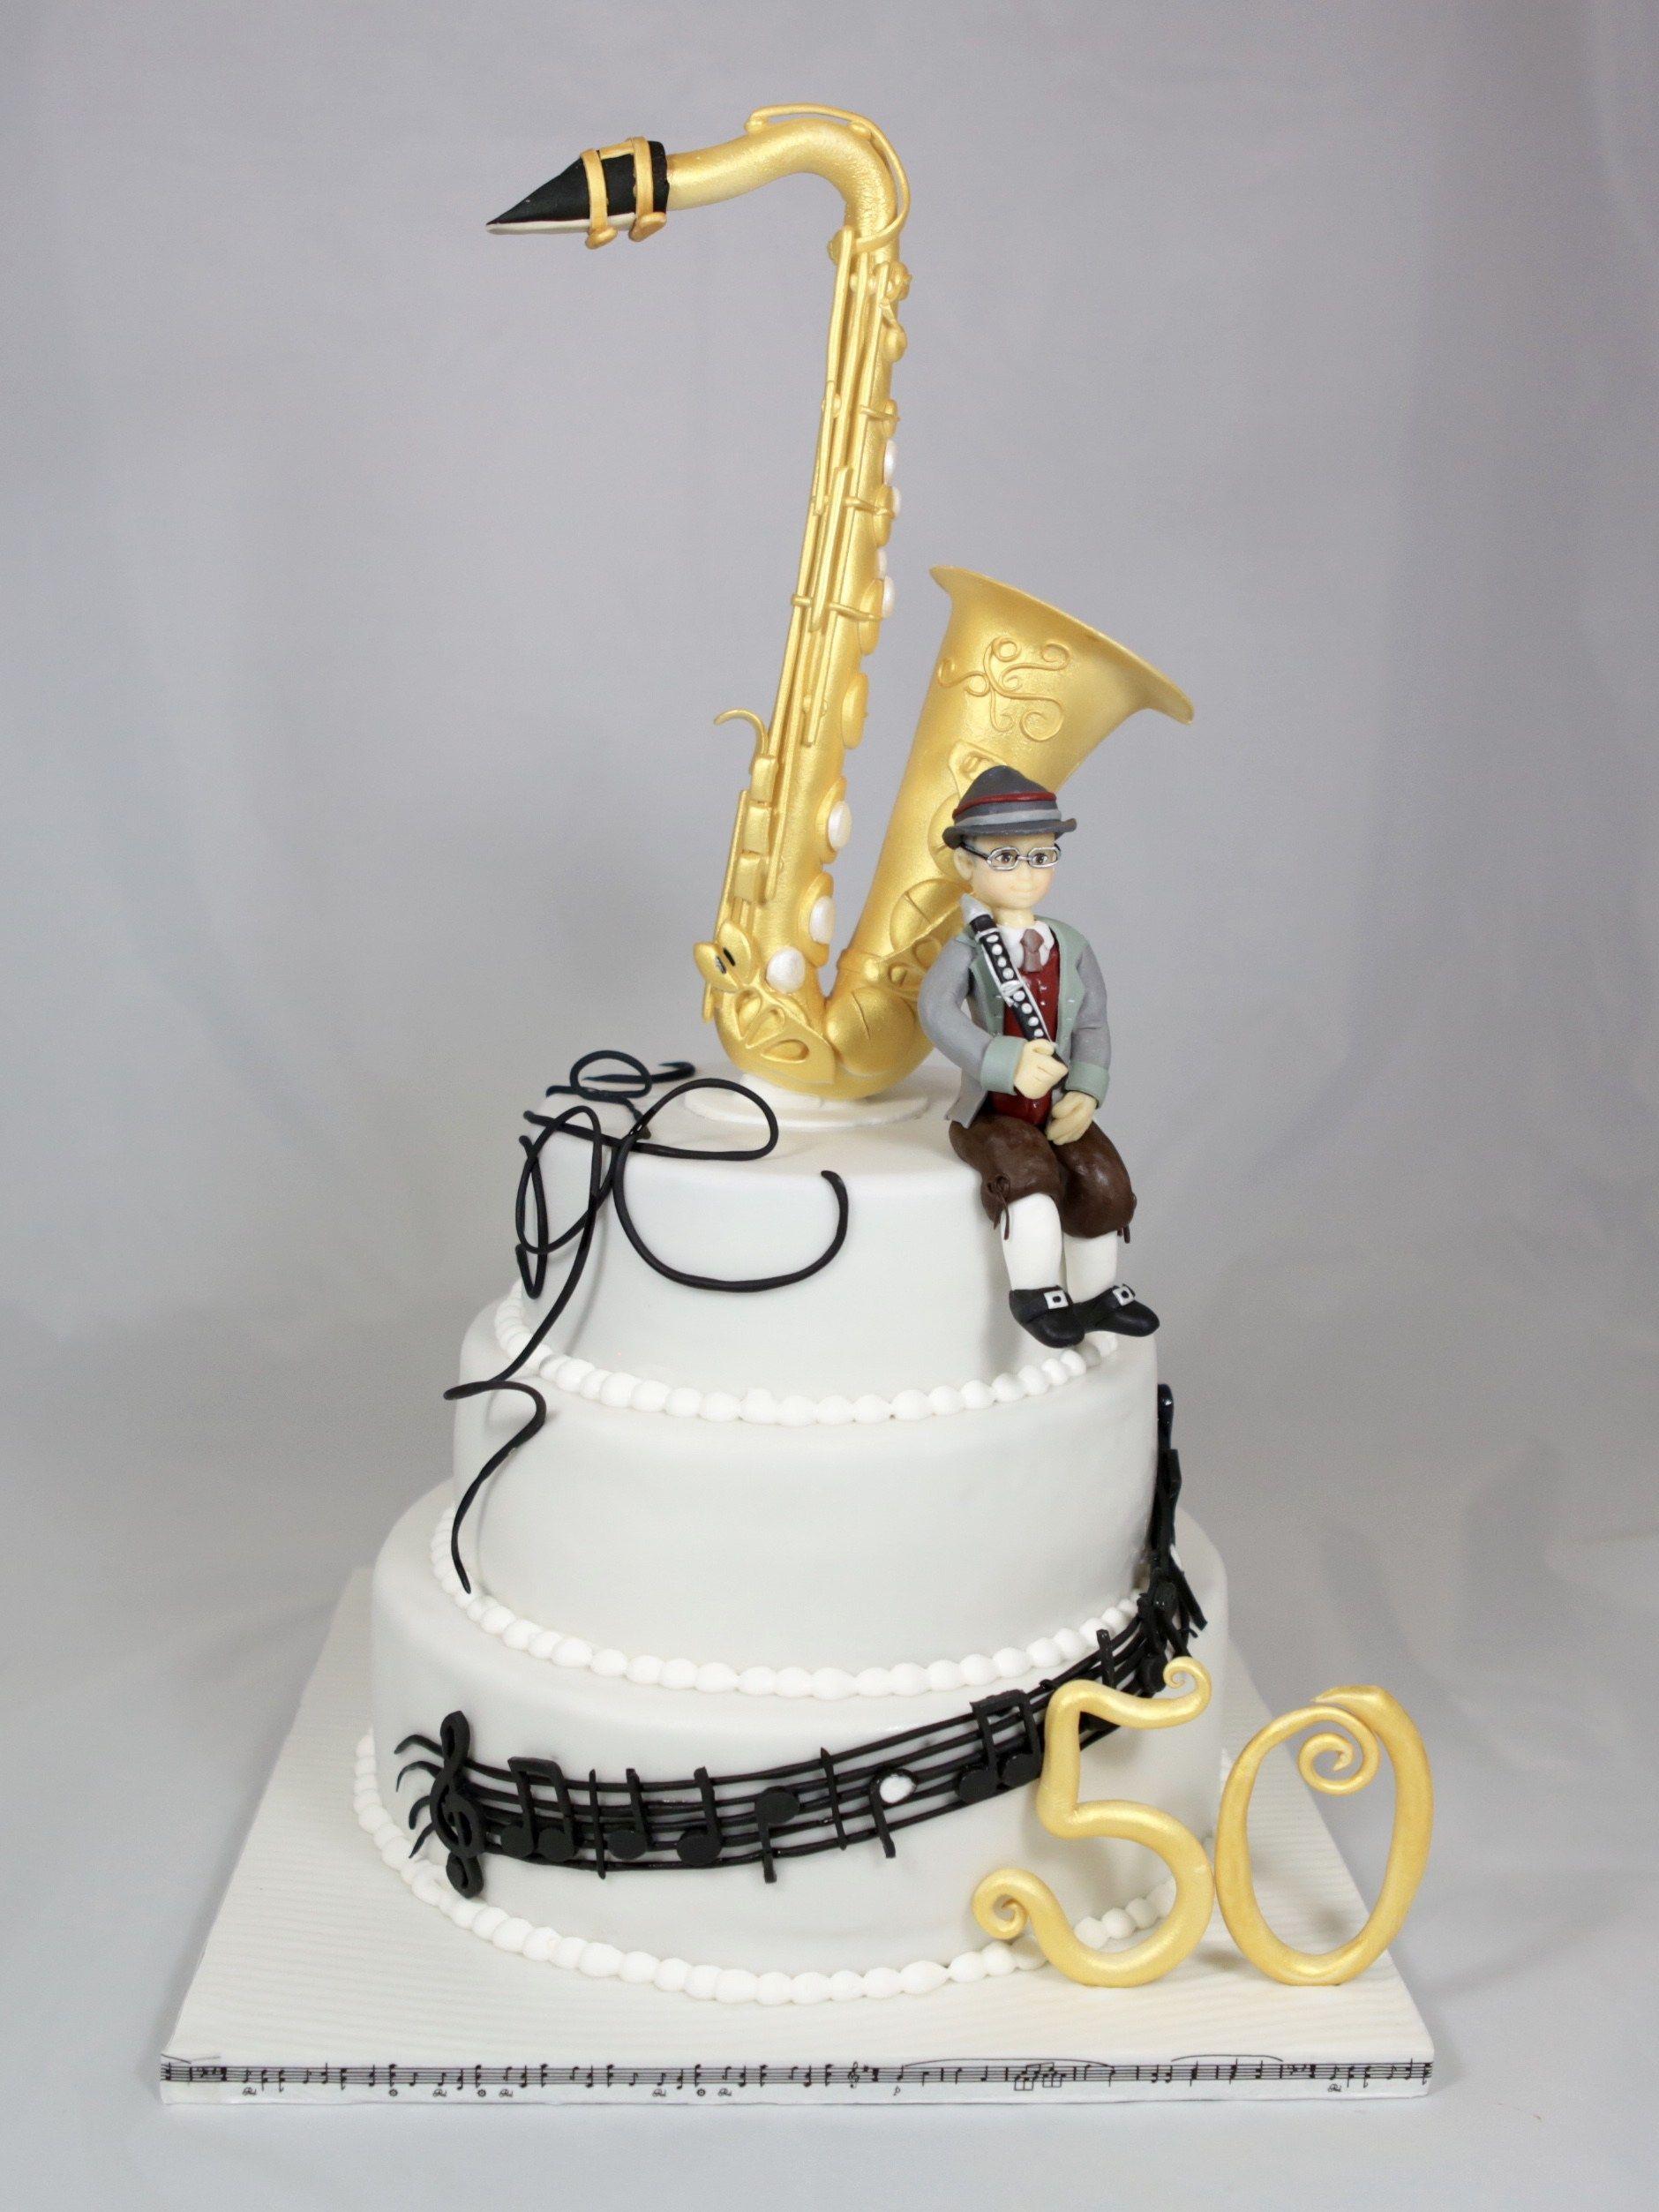 saxophon musik torte cake saxophone music motivtorten. Black Bedroom Furniture Sets. Home Design Ideas